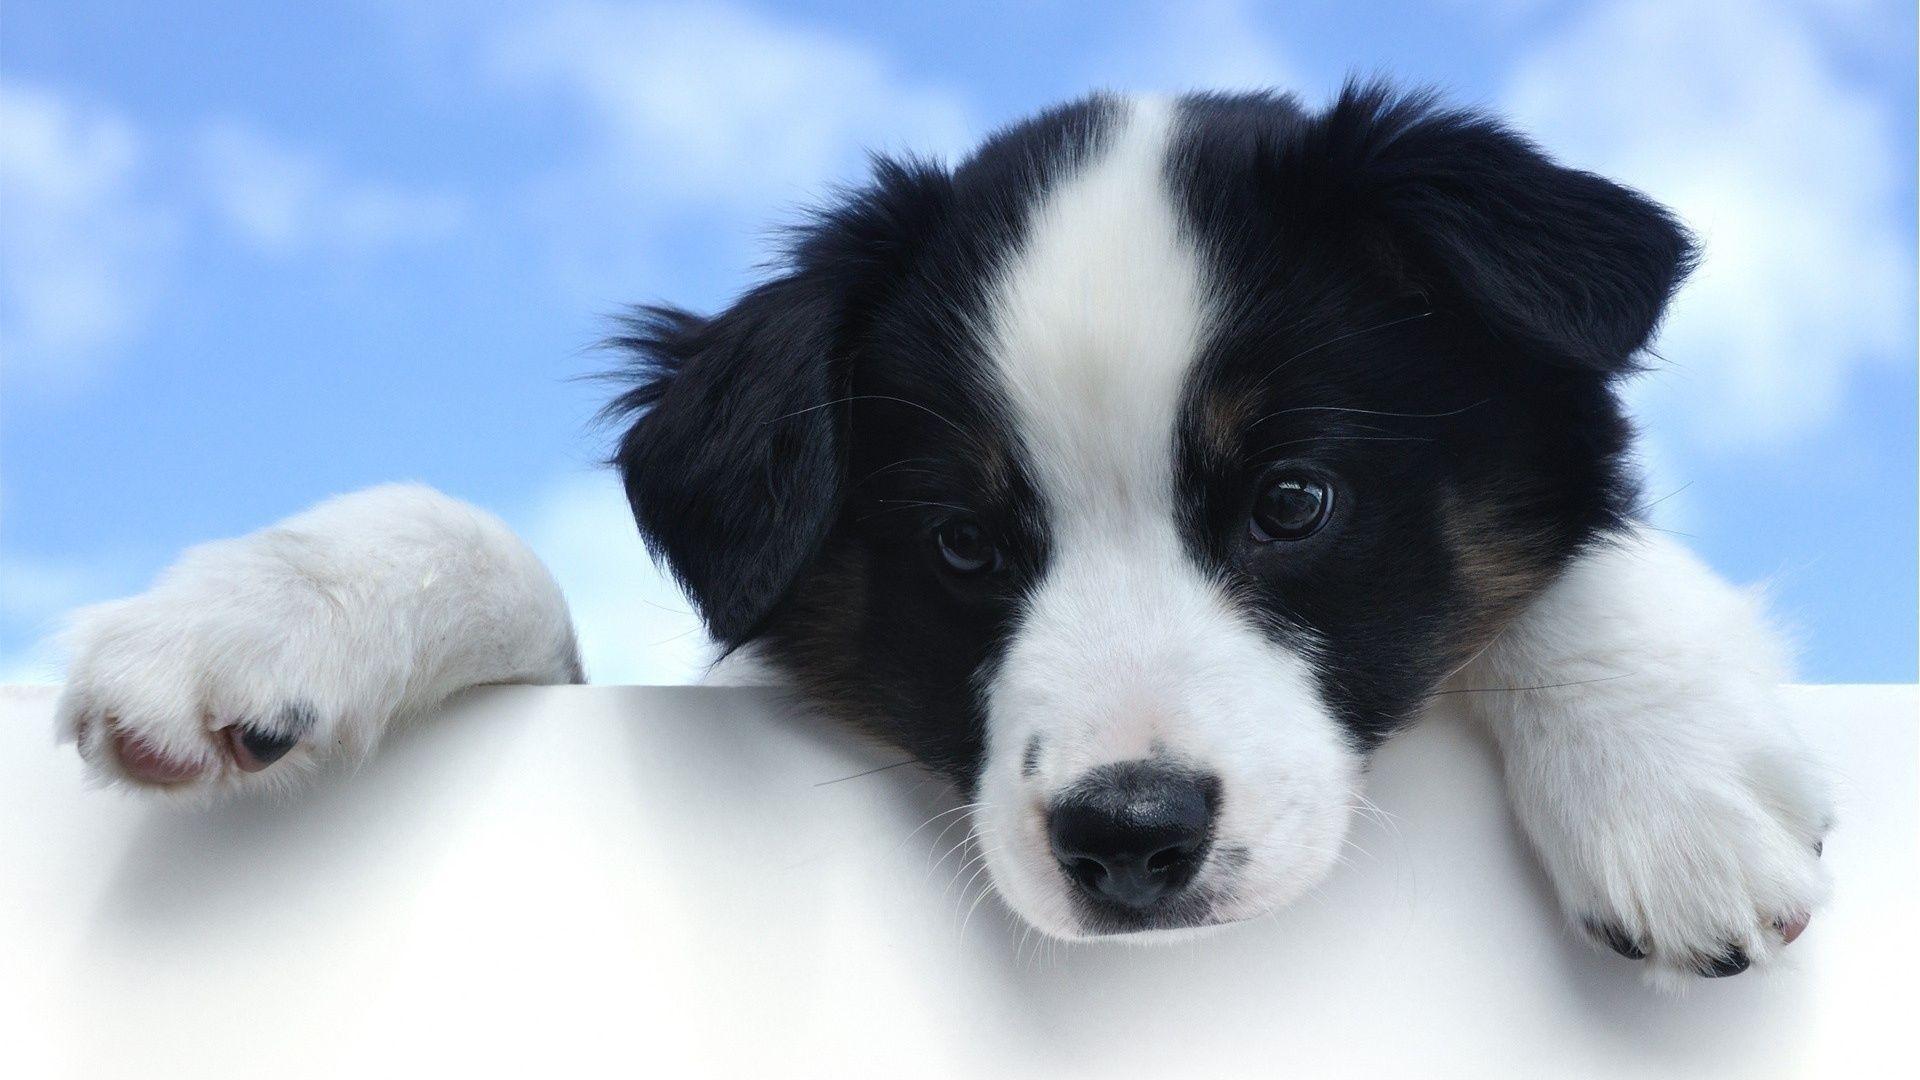 Black And White Dog Wallpaper Photo Sdeerwallpaper